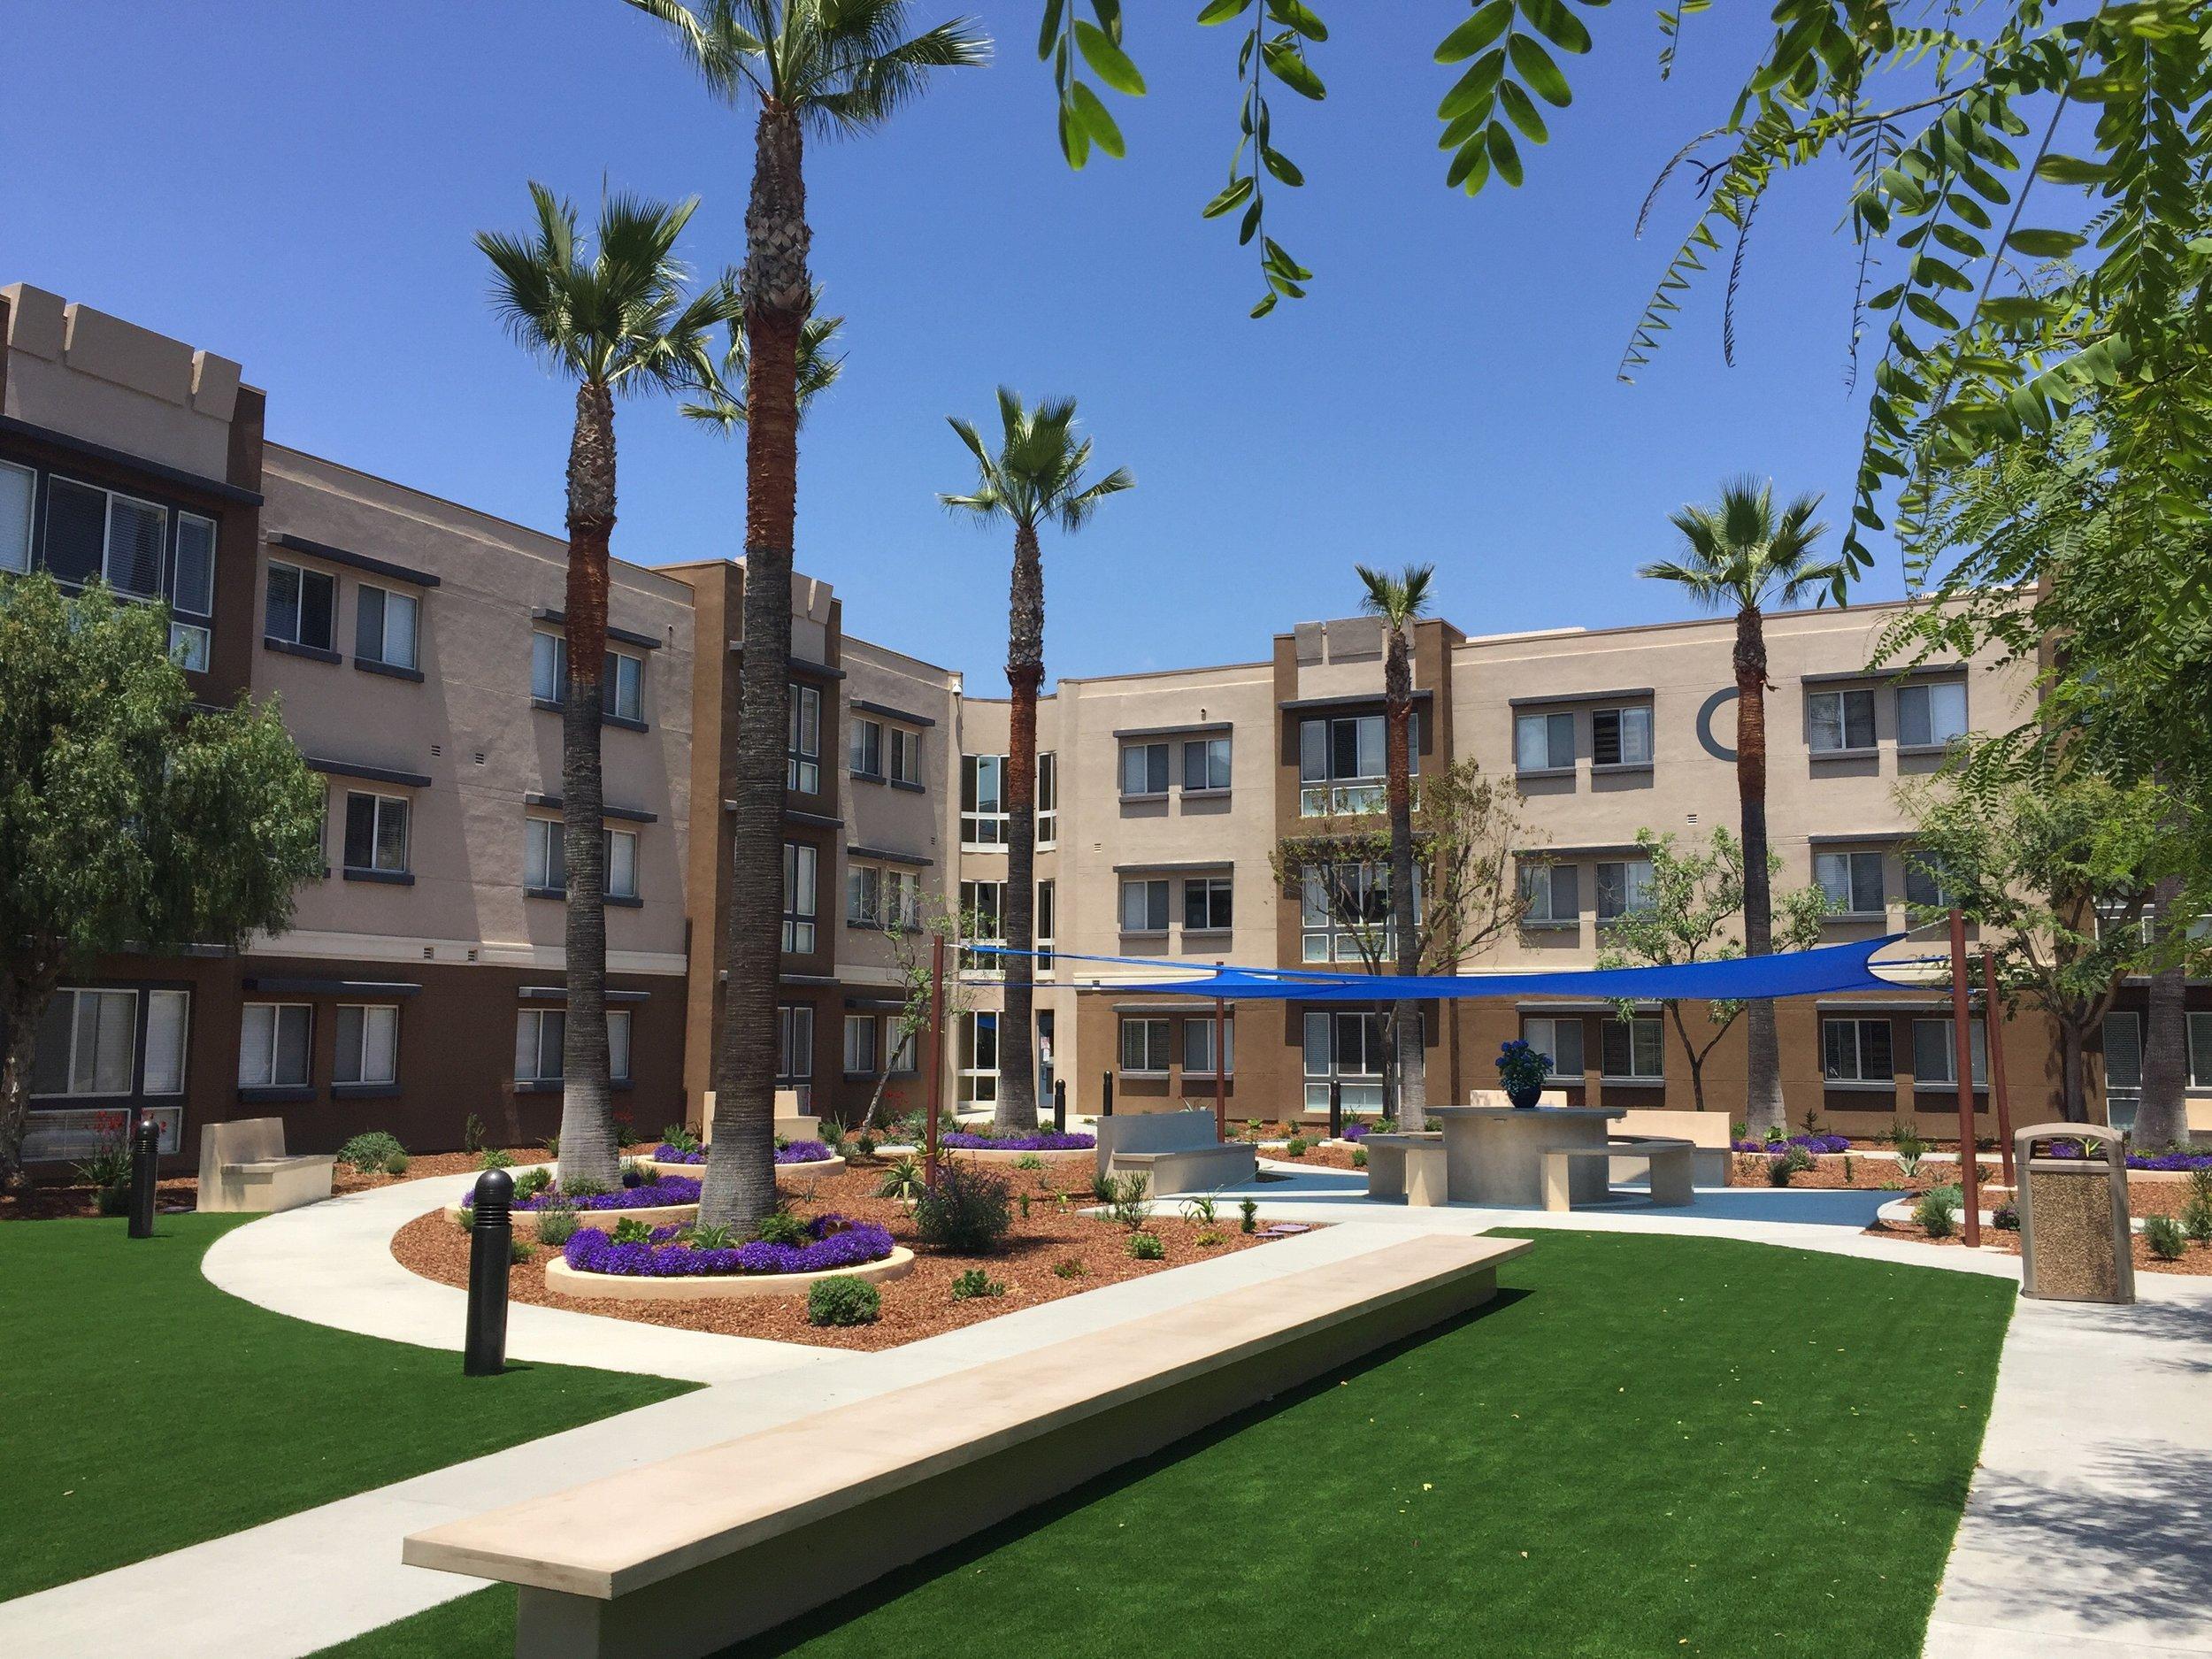 CSUSM courtyard_2016.jpg